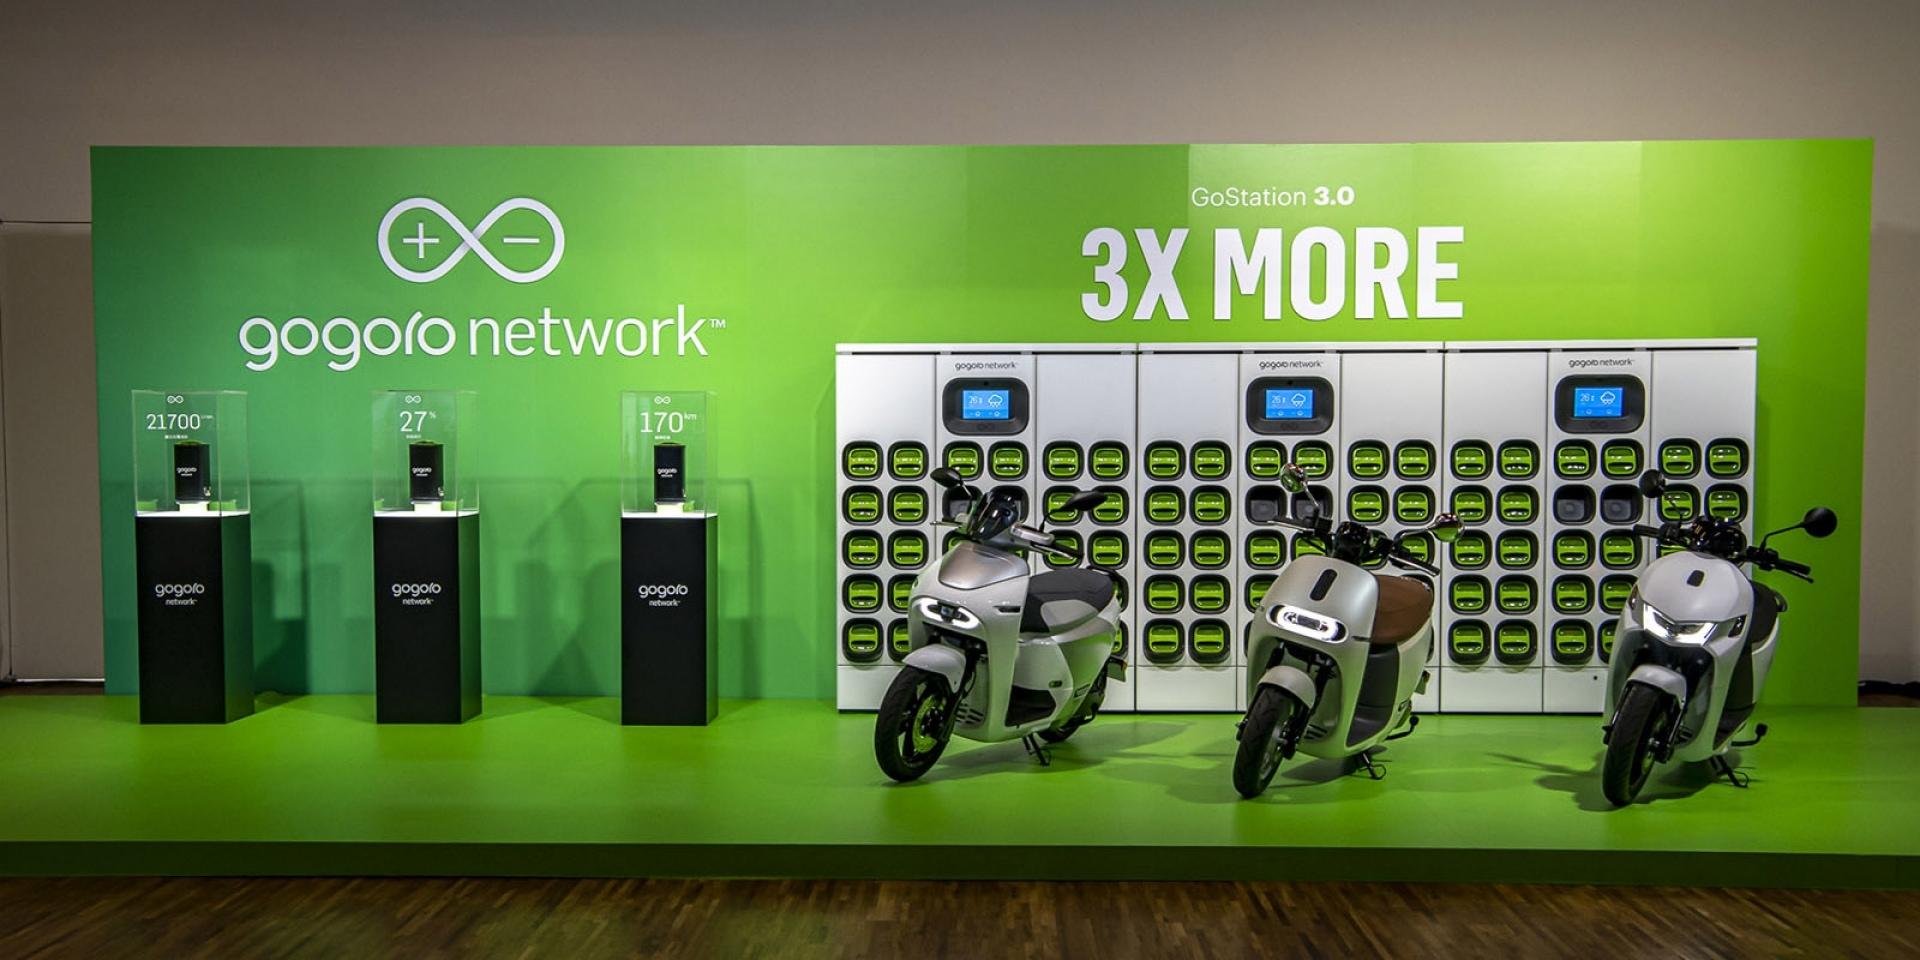 官方新聞稿。Gogoro Network™ 推出創新「自由省」資費方案,全新設計的 GoStation® 3.0、Super GoStation 電池交換站